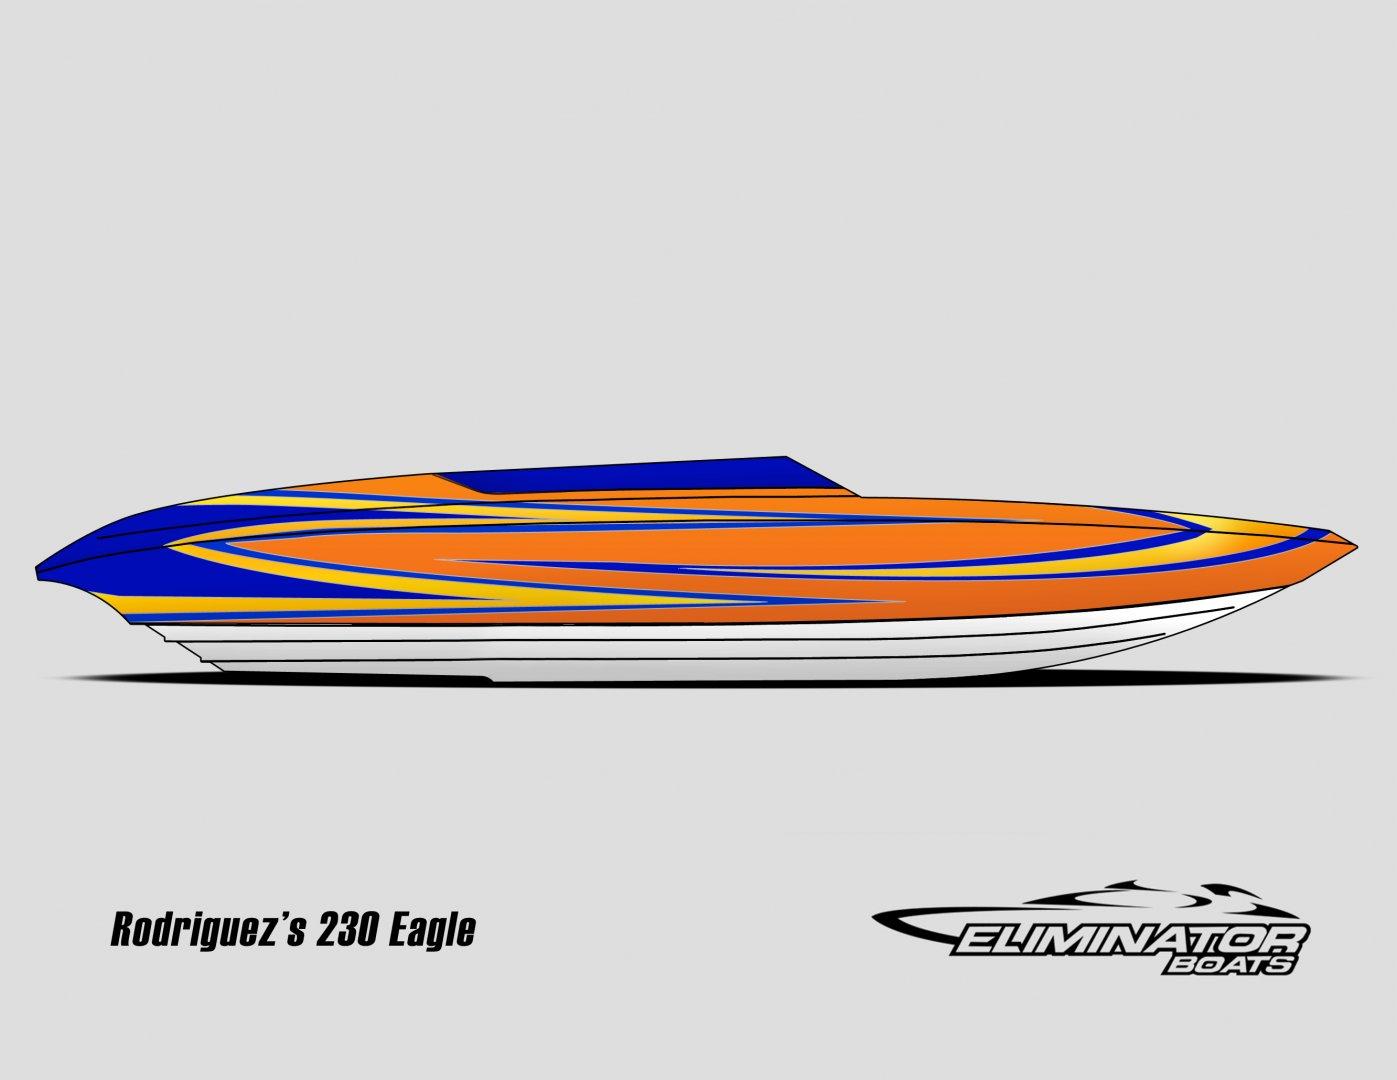 230eagle-john-rodriguez1.jpg